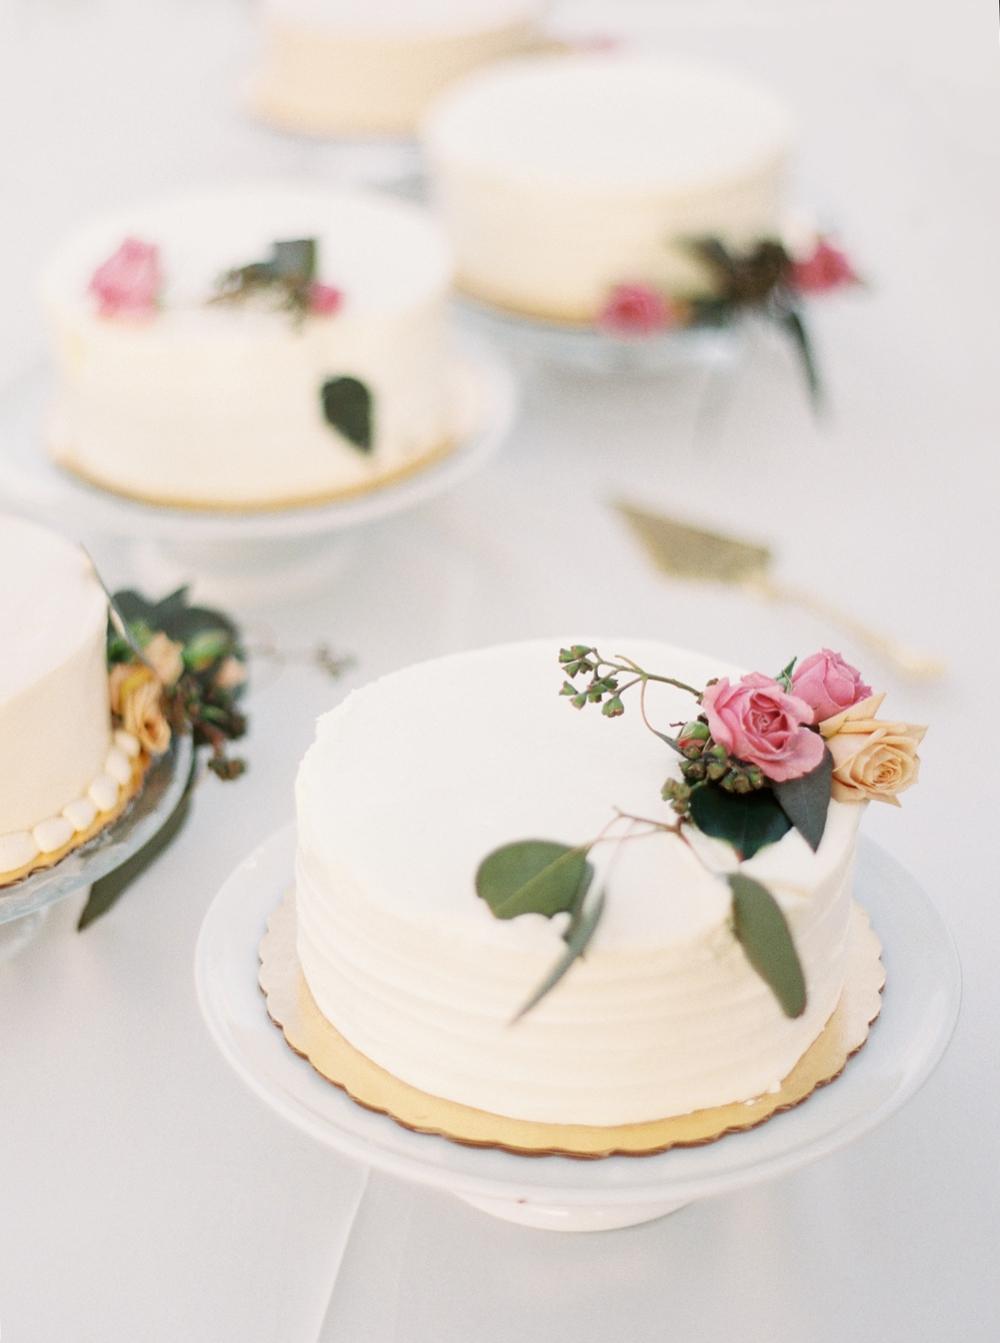 Austin Wedding Planner and Designer Lindsey Zamora